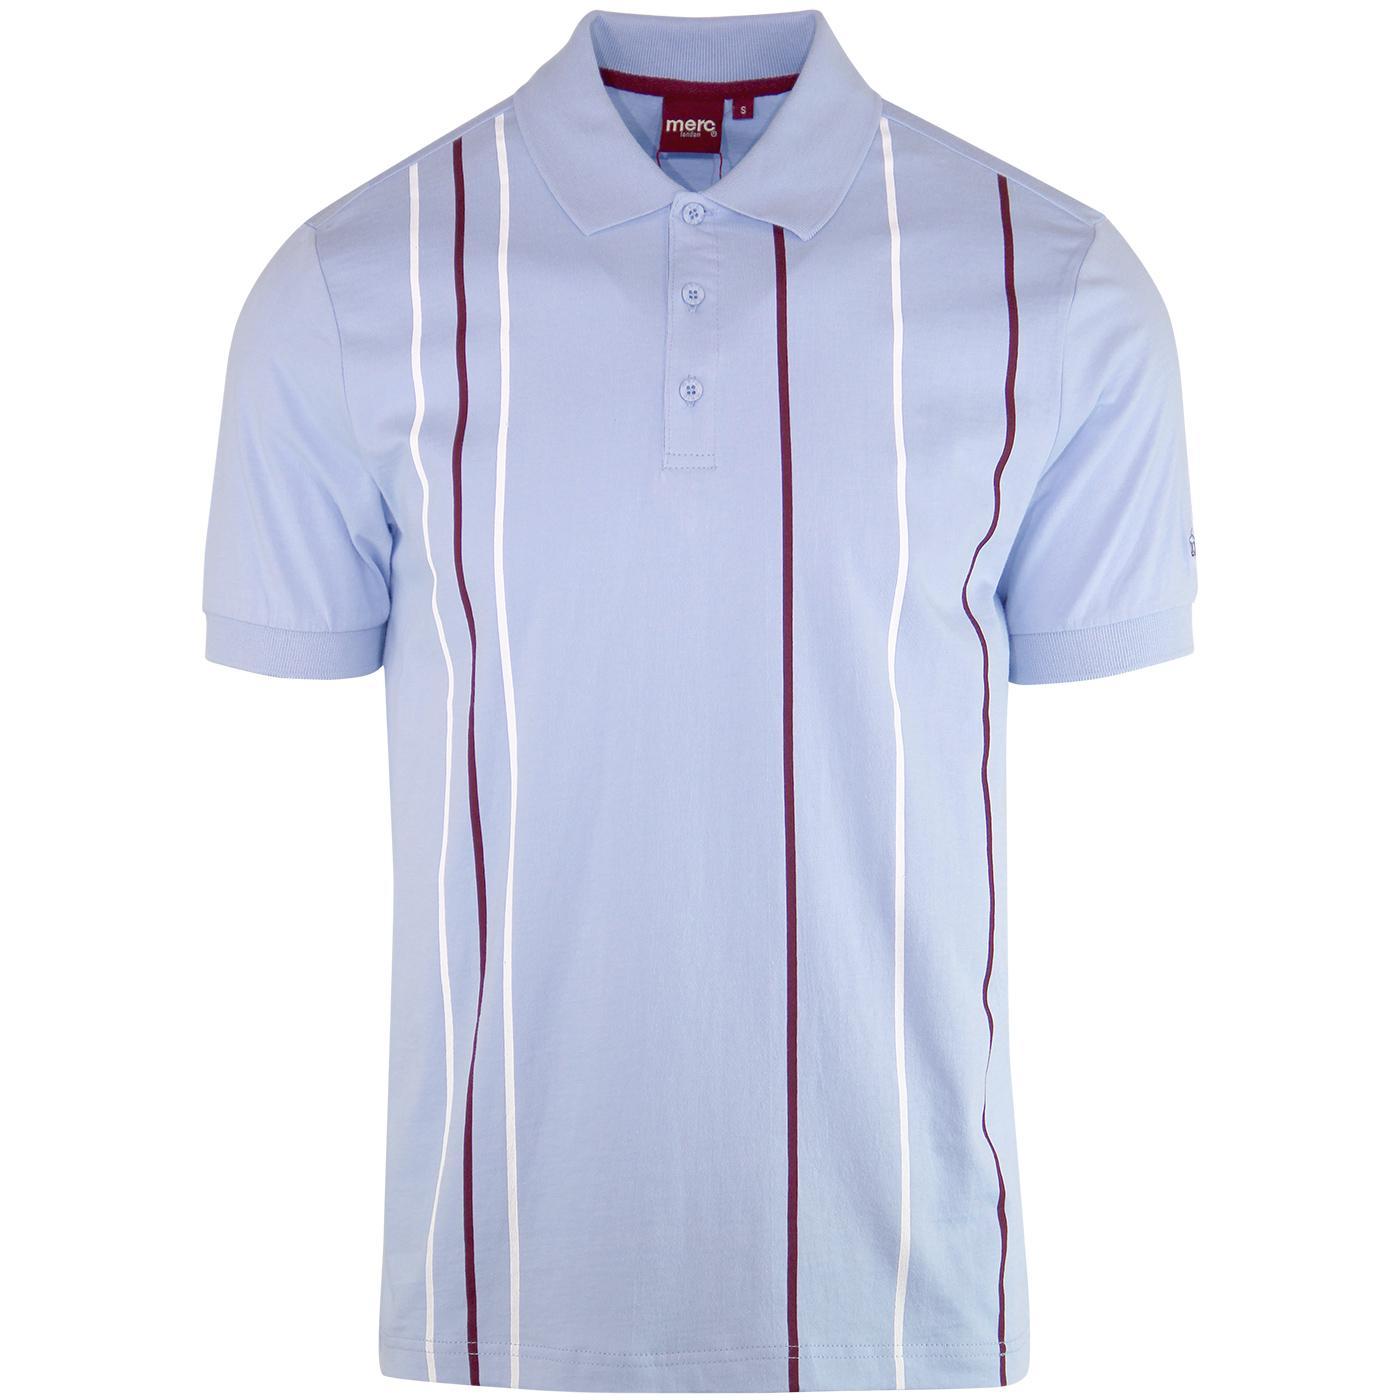 Randall MERC Mod Vertical Stripe Jersey Polo Top